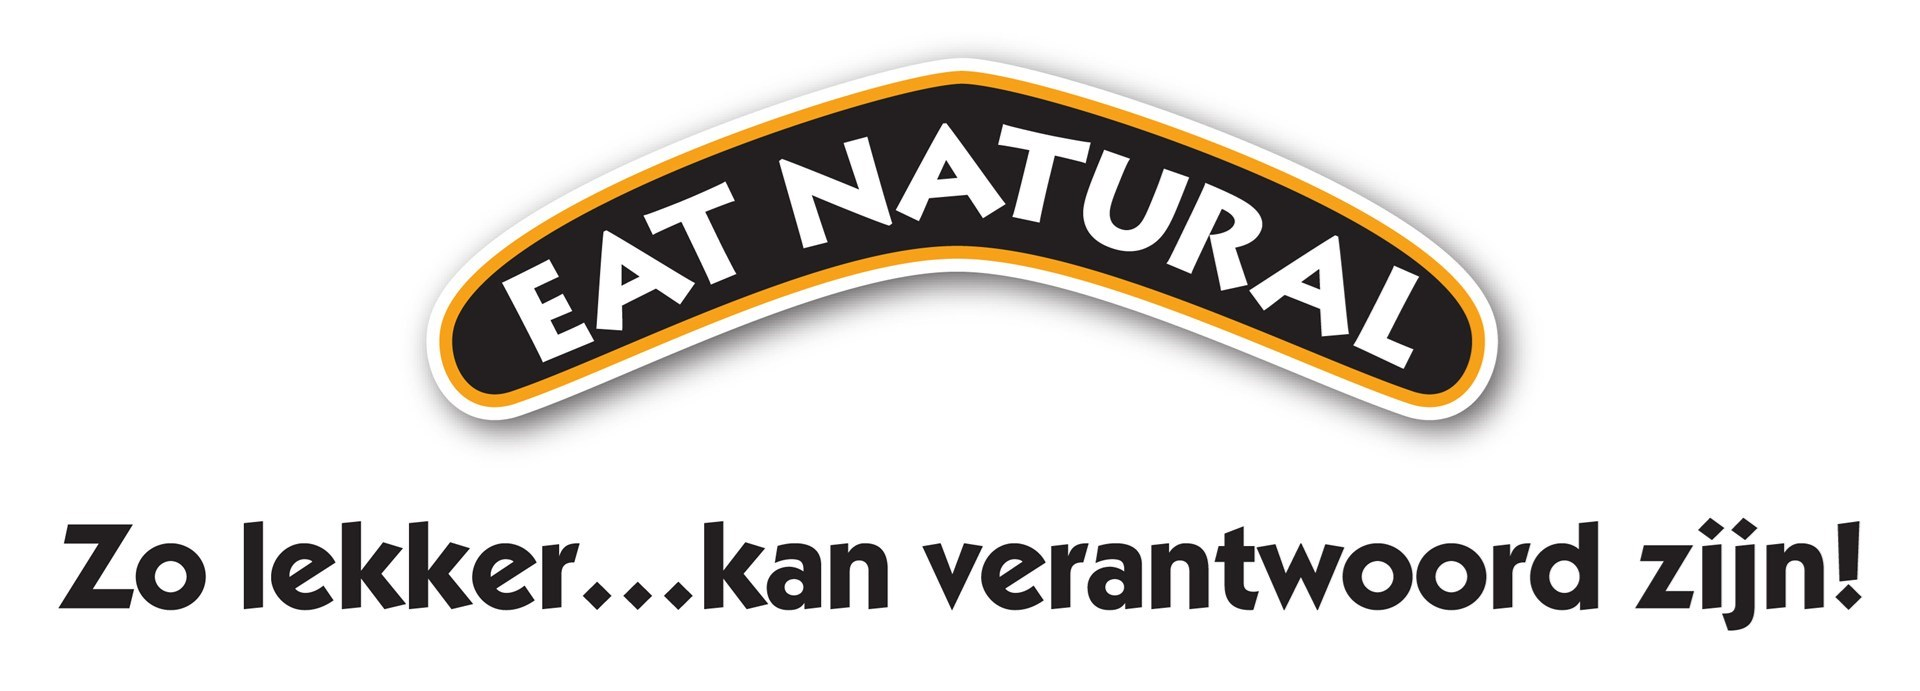 Merkafbeelding Eat Natural